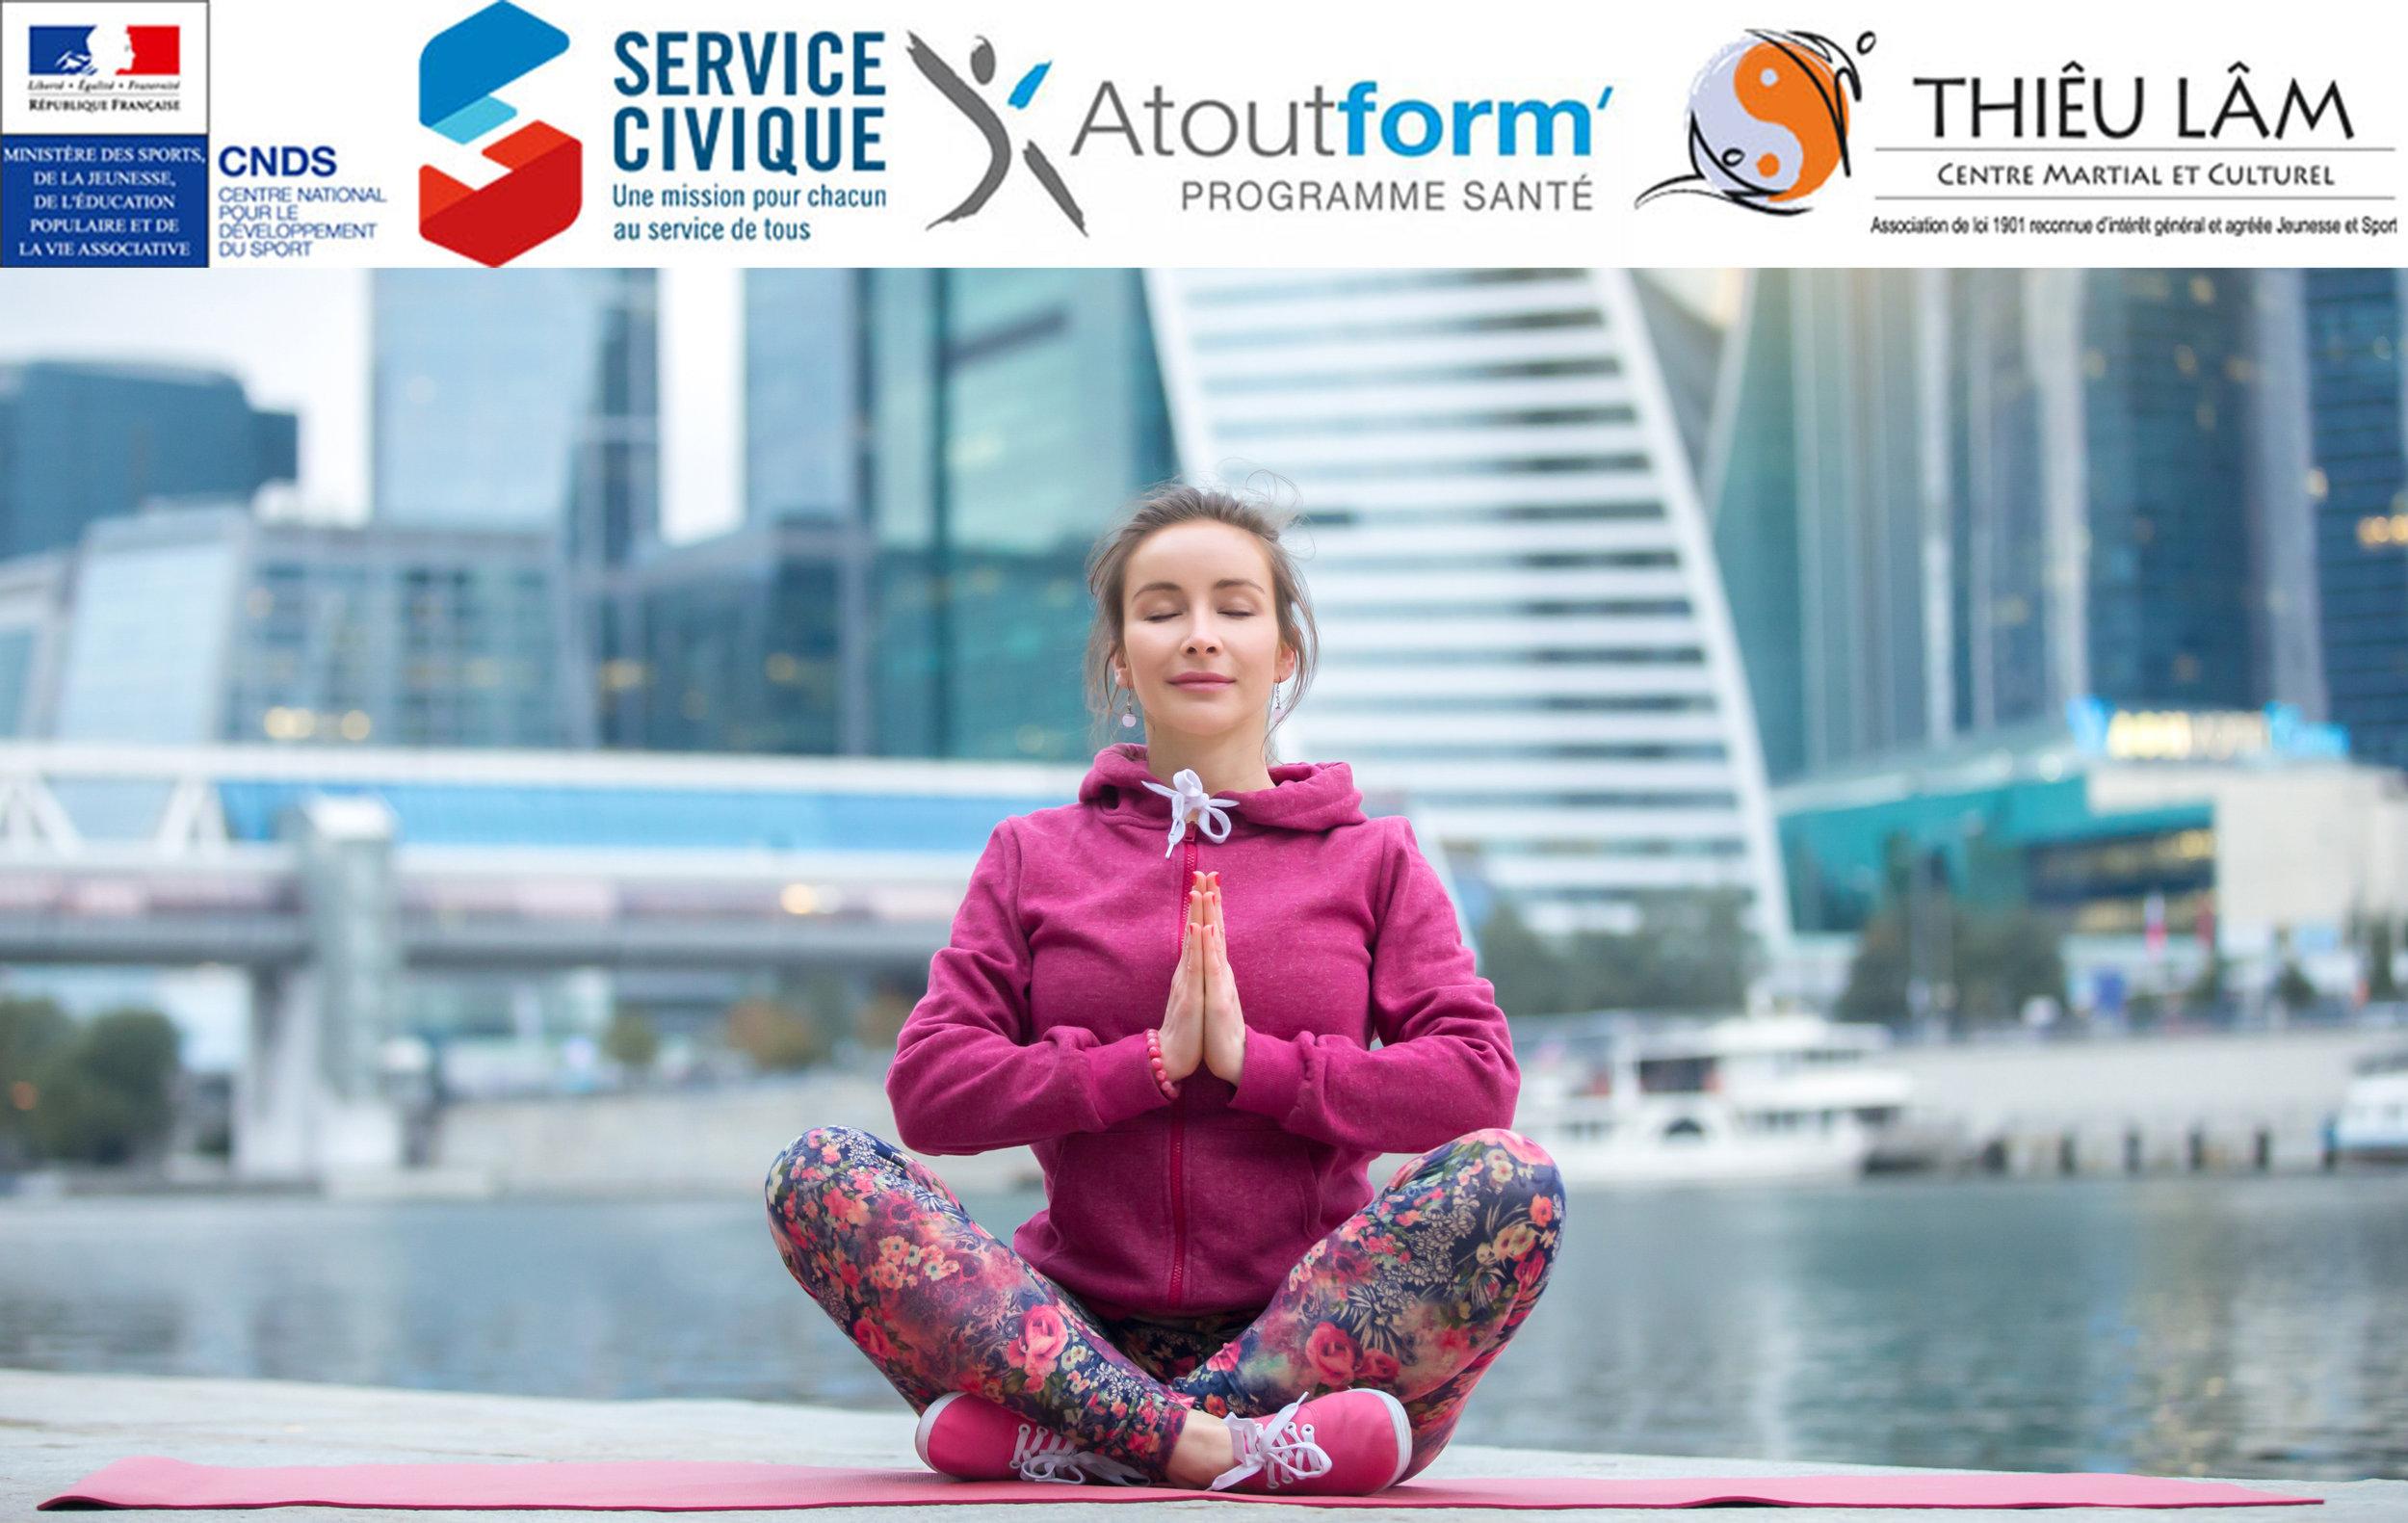 Hatha Yoga Pranayama Centre Thiêu Lâm àAussonne